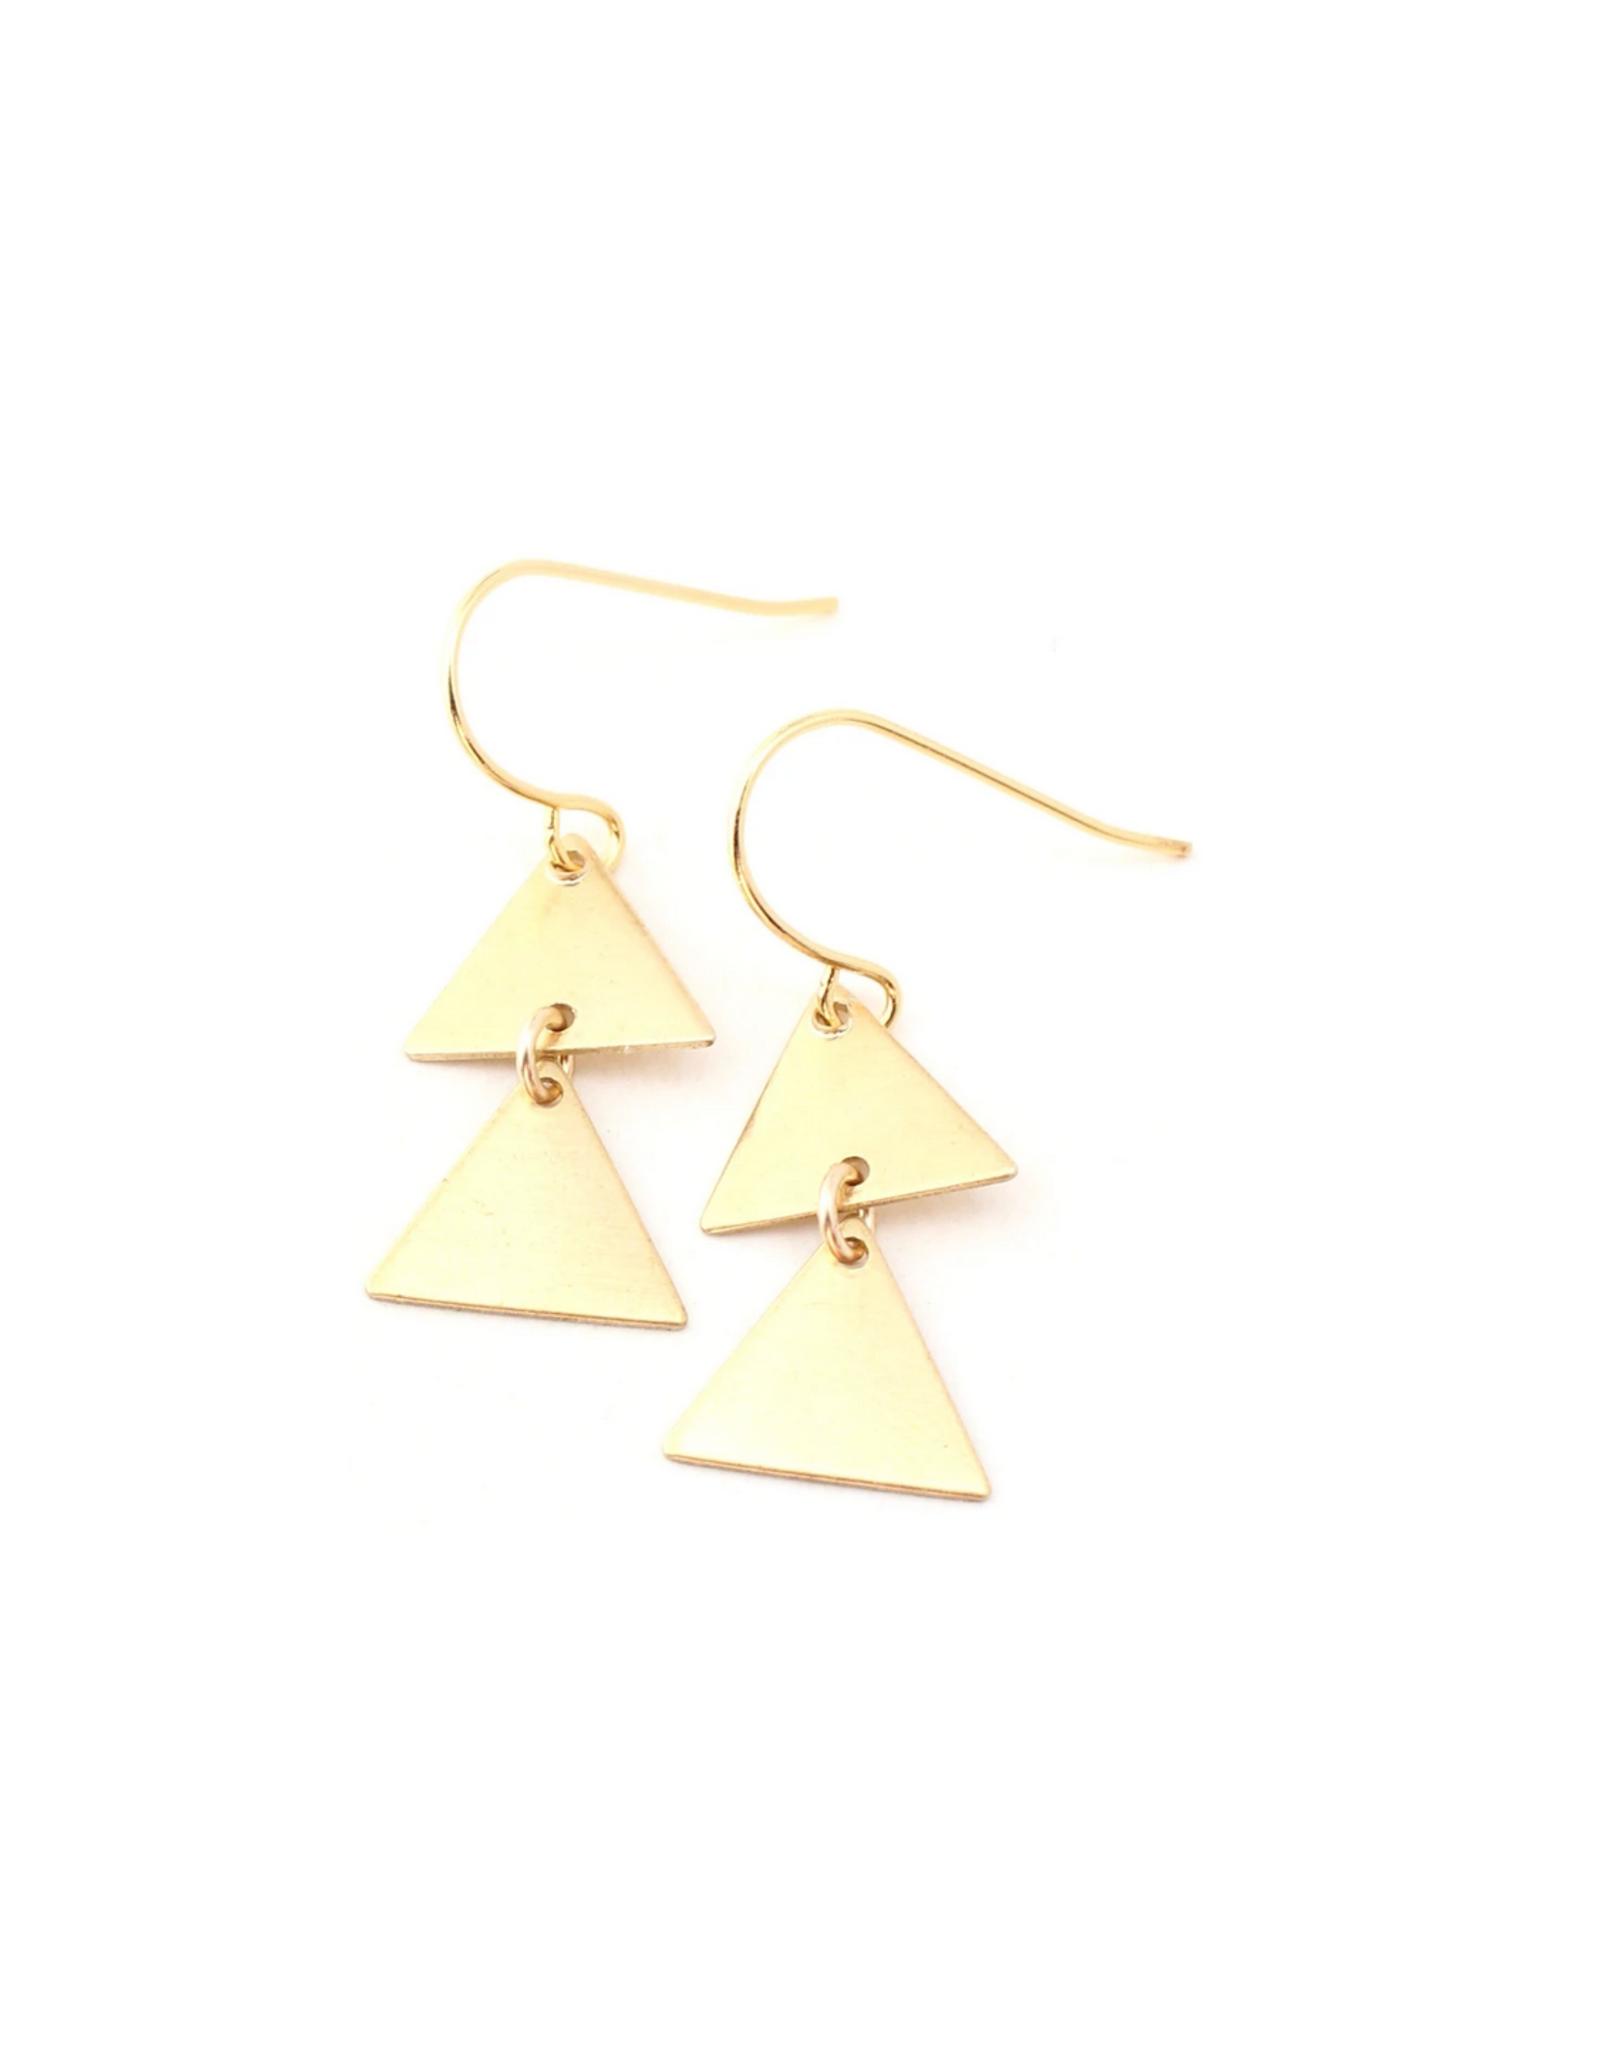 Rimi Double Triangle Charm Earrings